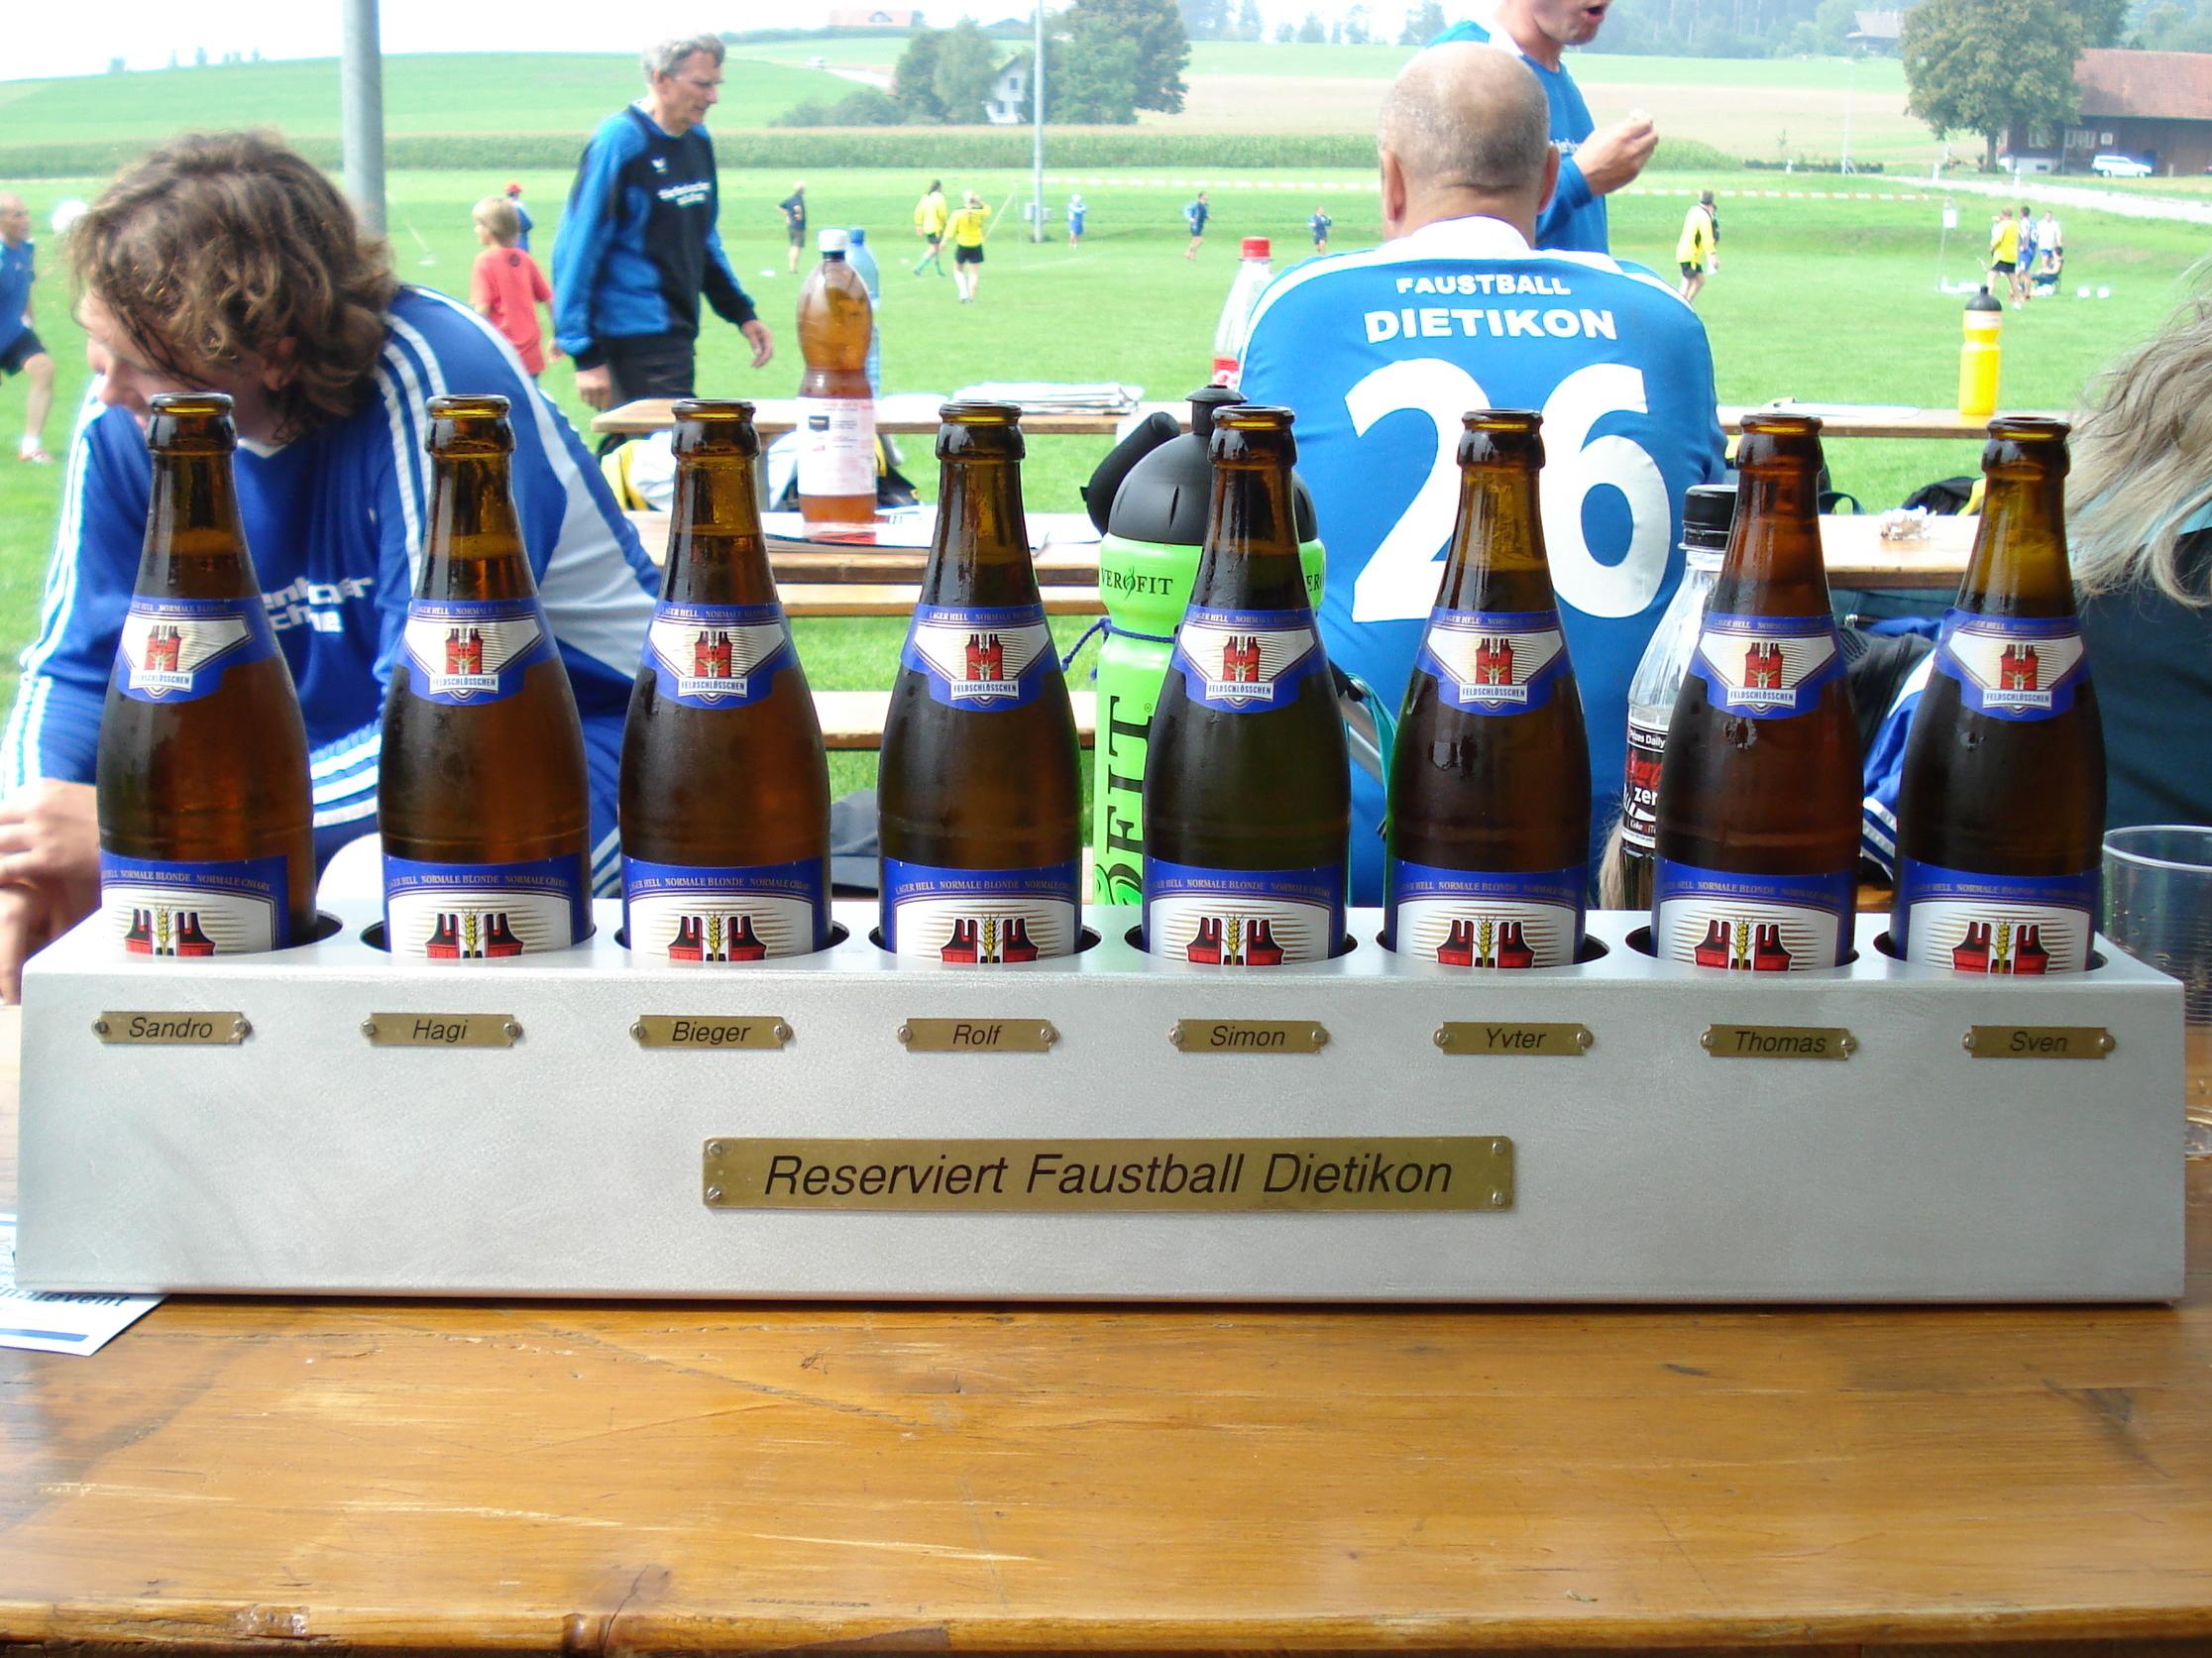 31/08/08: Meisterschaft, FB Dietikon 3, 4, 5